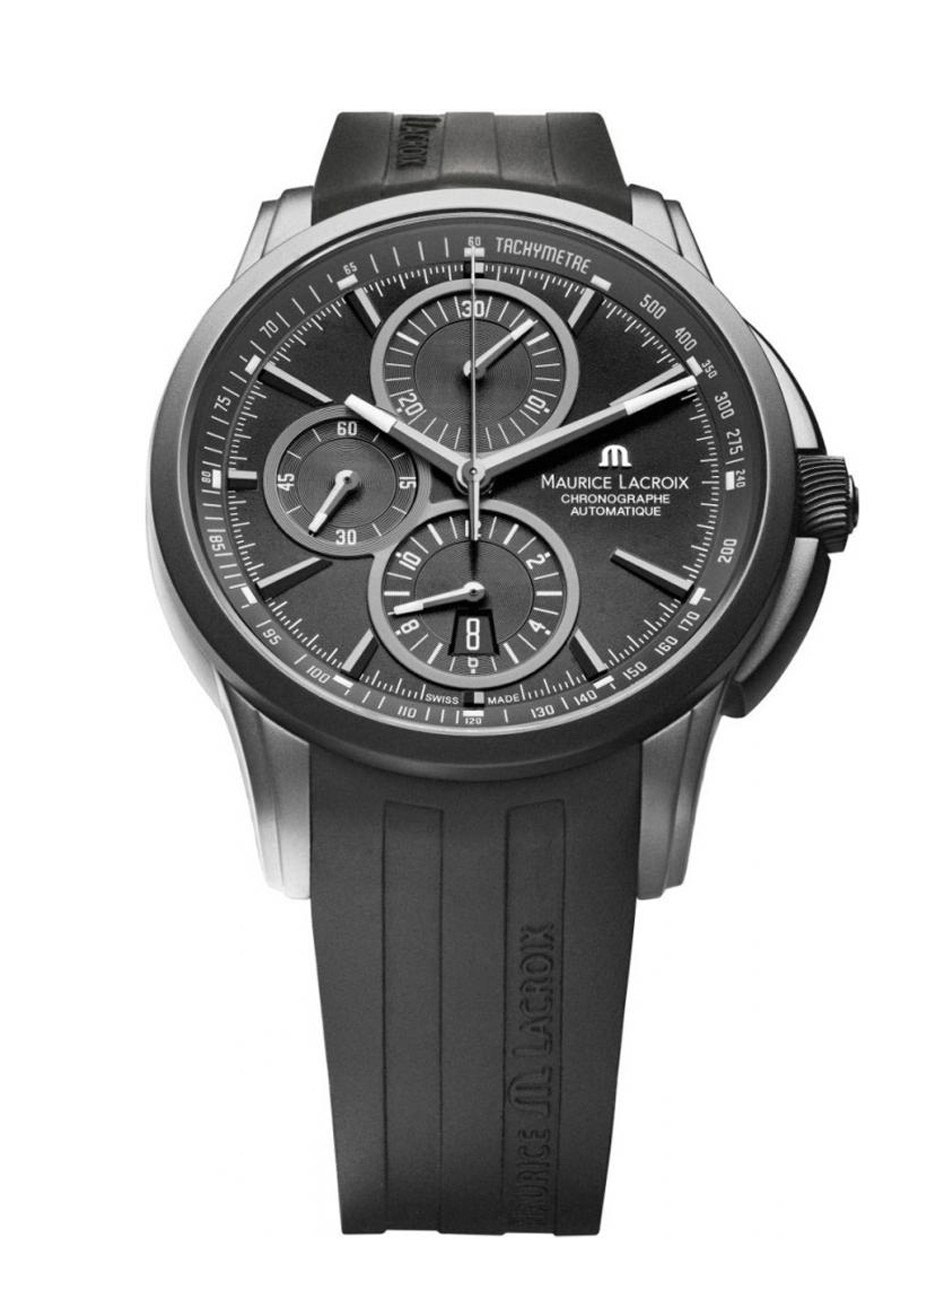 Lacroix Chronographe Ss001 Pontos Maurice Pt6188 331 EDeWIYbH29